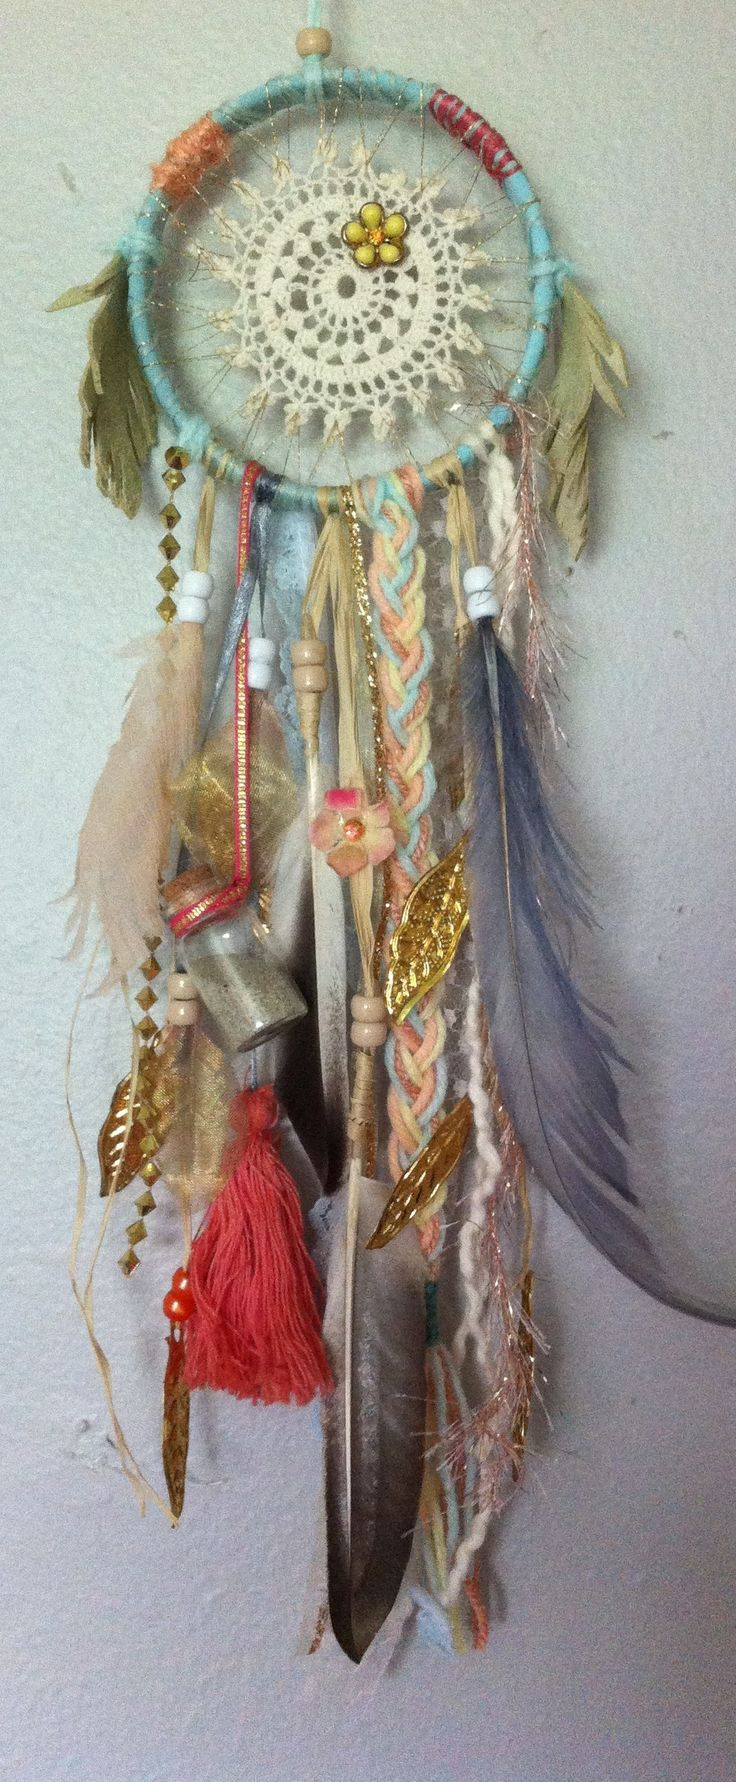 "5"" dreamcatcher by Rachael Rice http://rachaelrice.com/art/custom-orders"